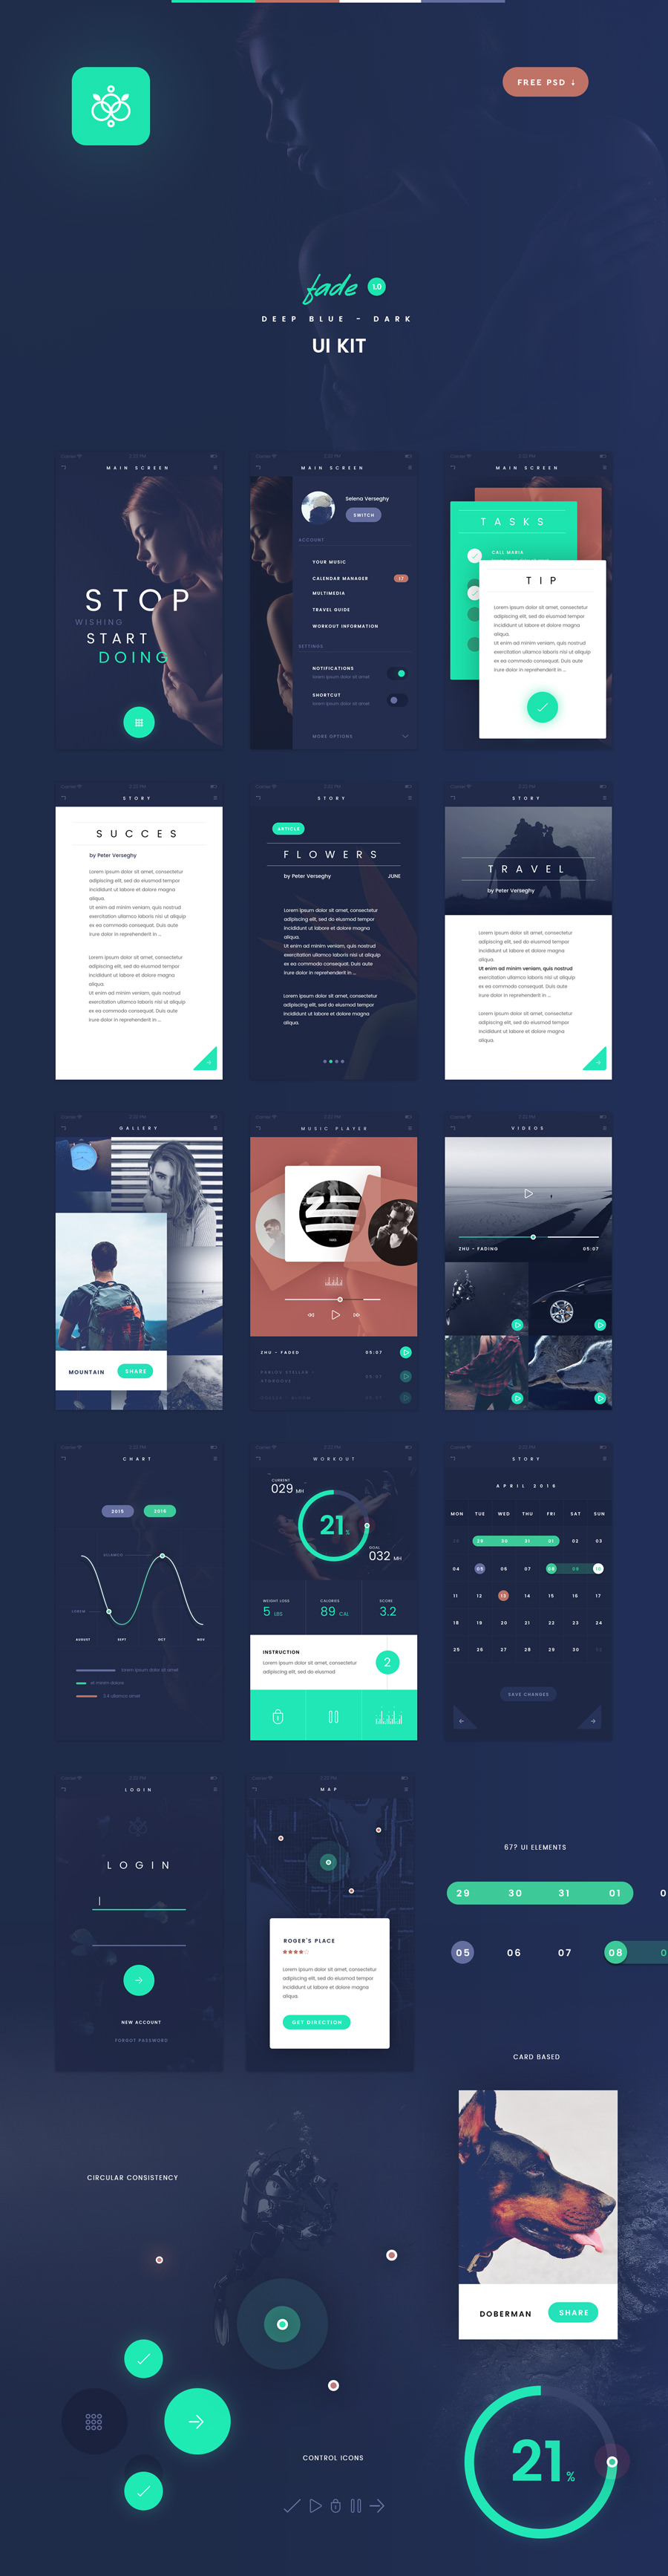 graphicghost_fade_app_ui_kit